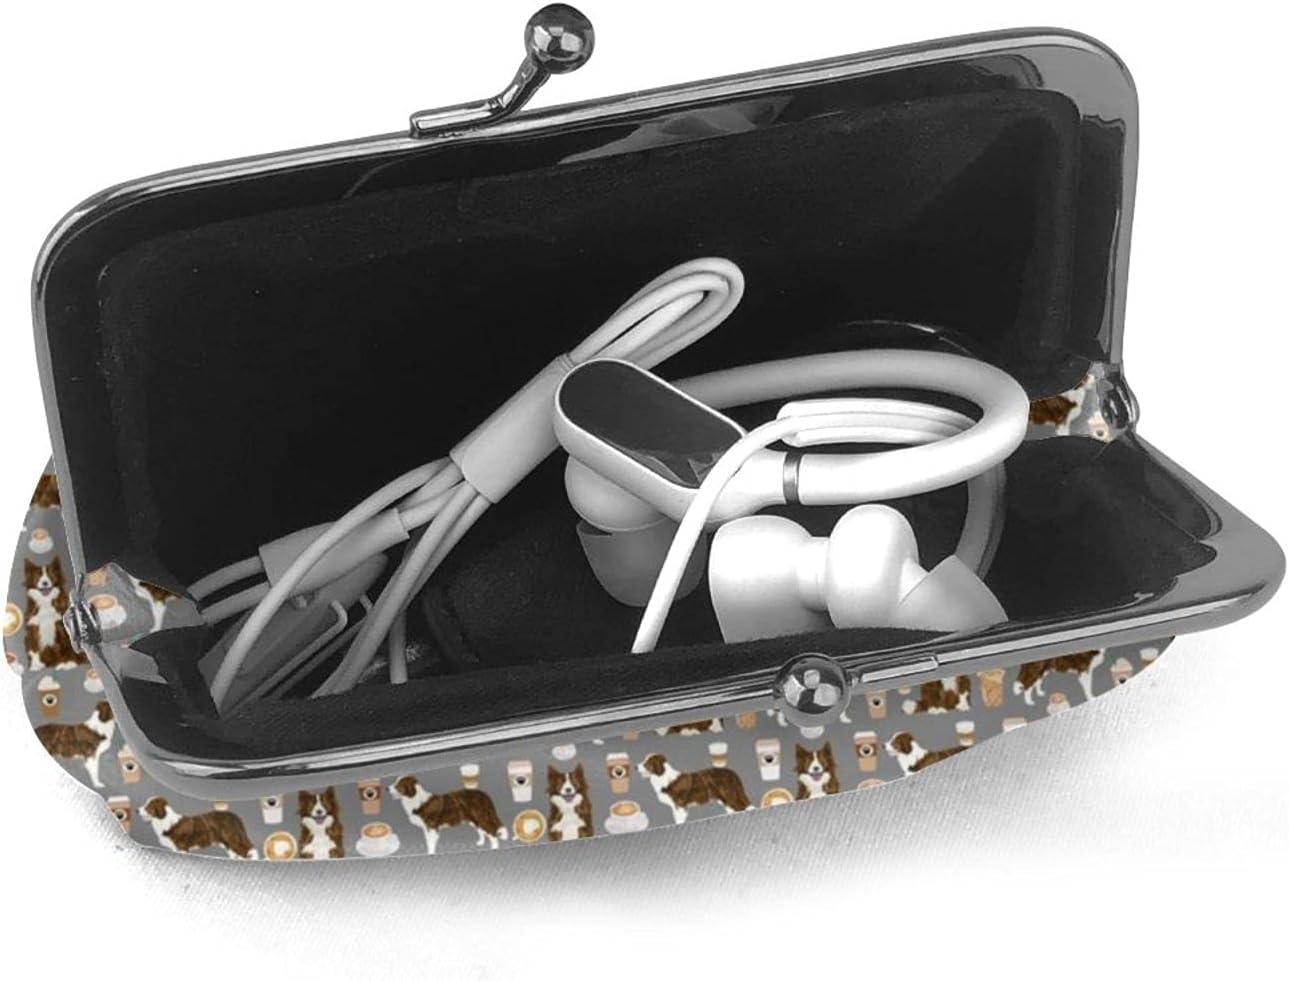 Brindle Border Collie 1247 Women'S Wallet Buckle Coin Purses Pouch Kiss-lock Change Travel Makeup Wallets, Black, One Size